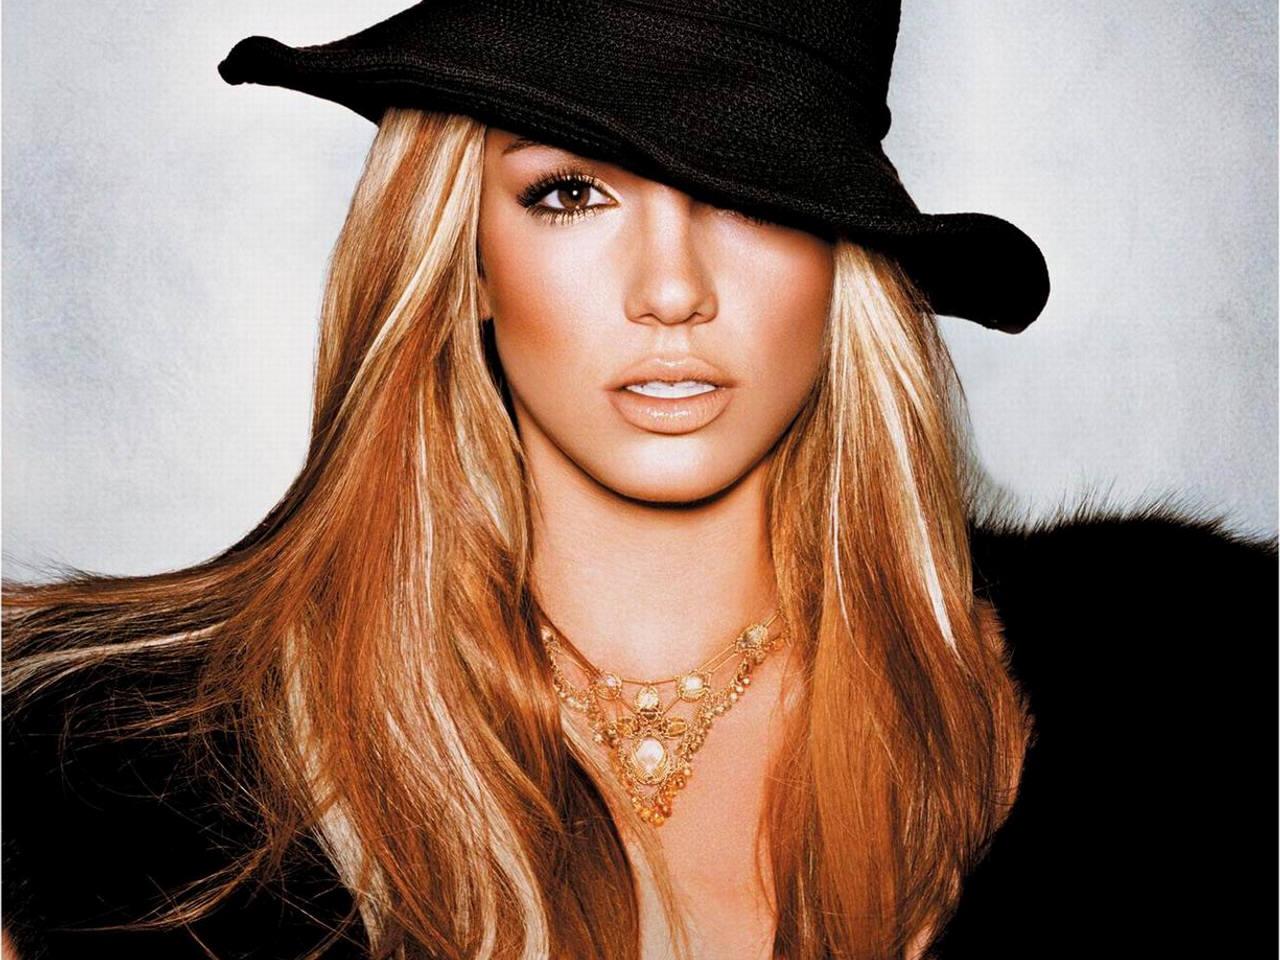 http://4.bp.blogspot.com/_yNFpw120XLc/TIfOa7q70CI/AAAAAAAAV8Q/SmH40NOKj90/s1600/Britney+Spears119-719474.jpg